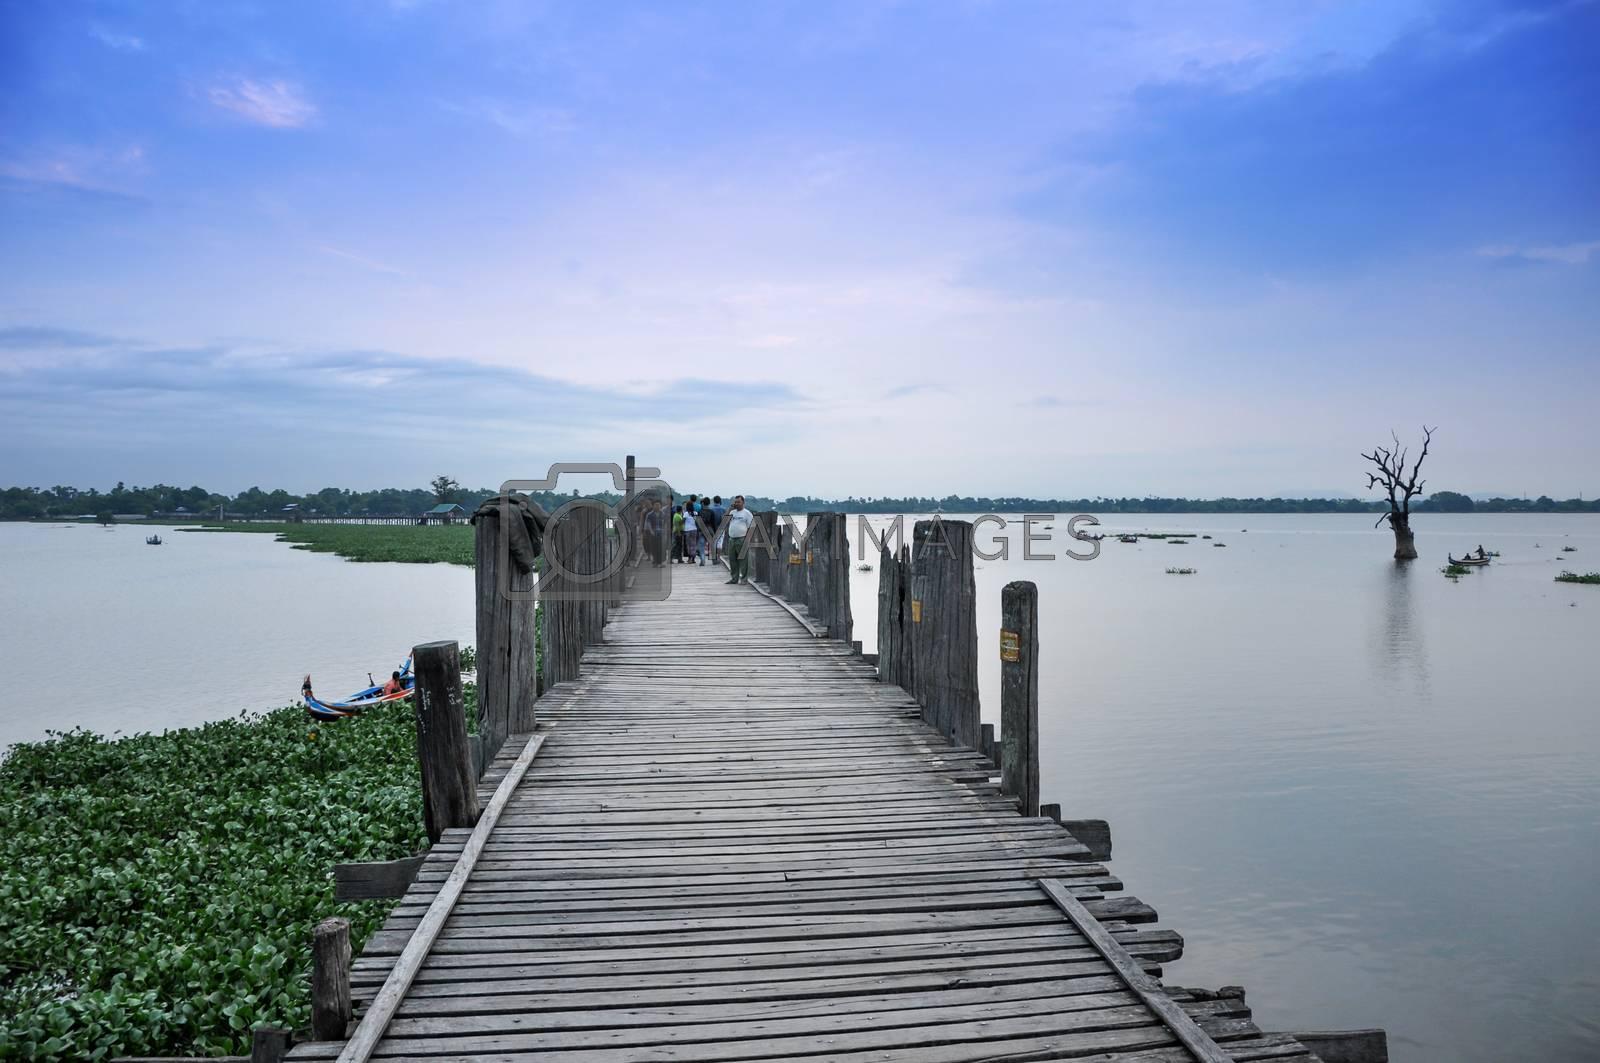 U Bein Bridge, Amarapura, Myanmar  by siraanamwong